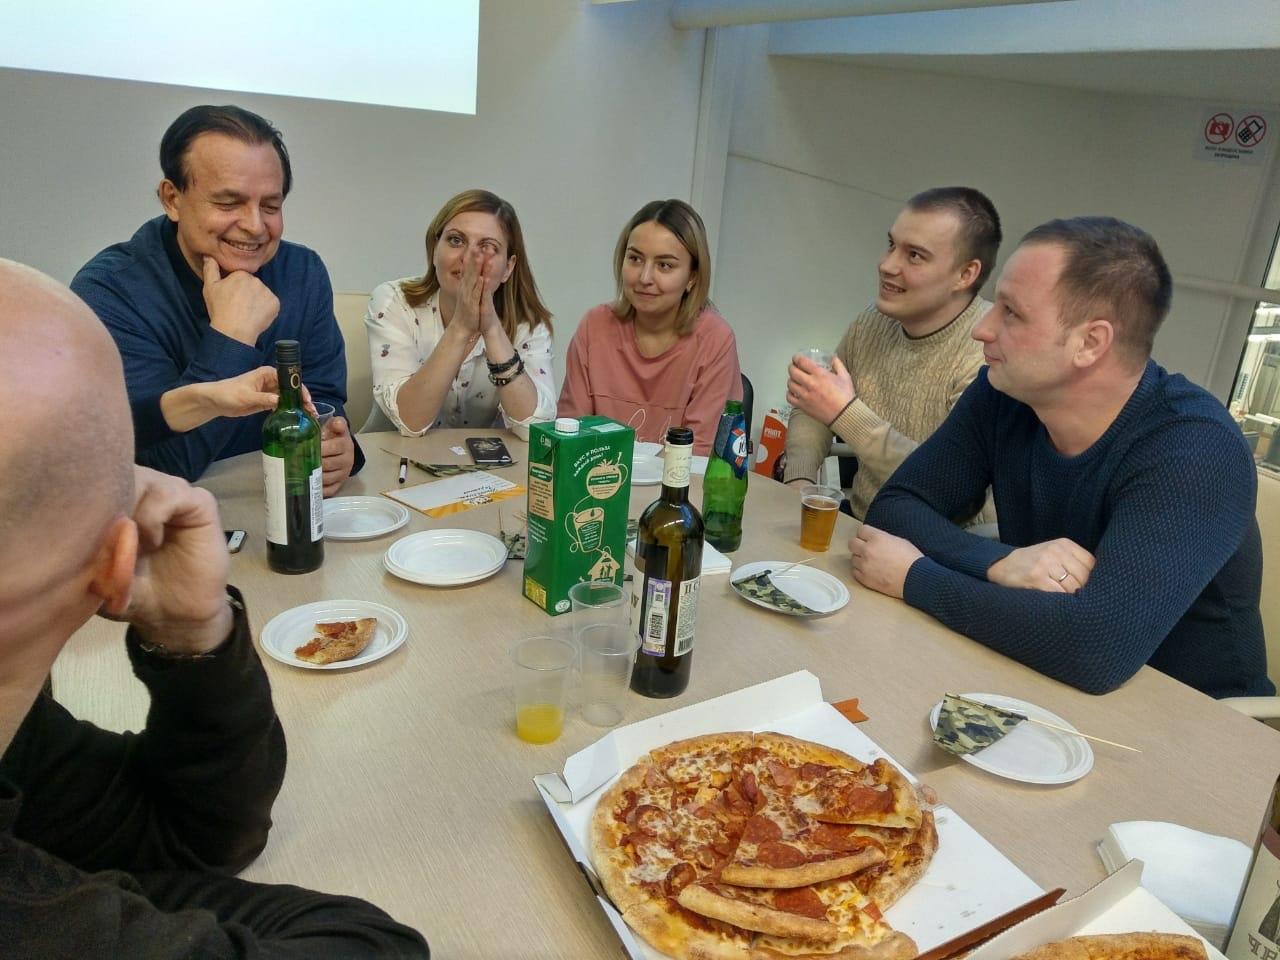 Организация праздников и мероприятий от ивент агенства mur.ru